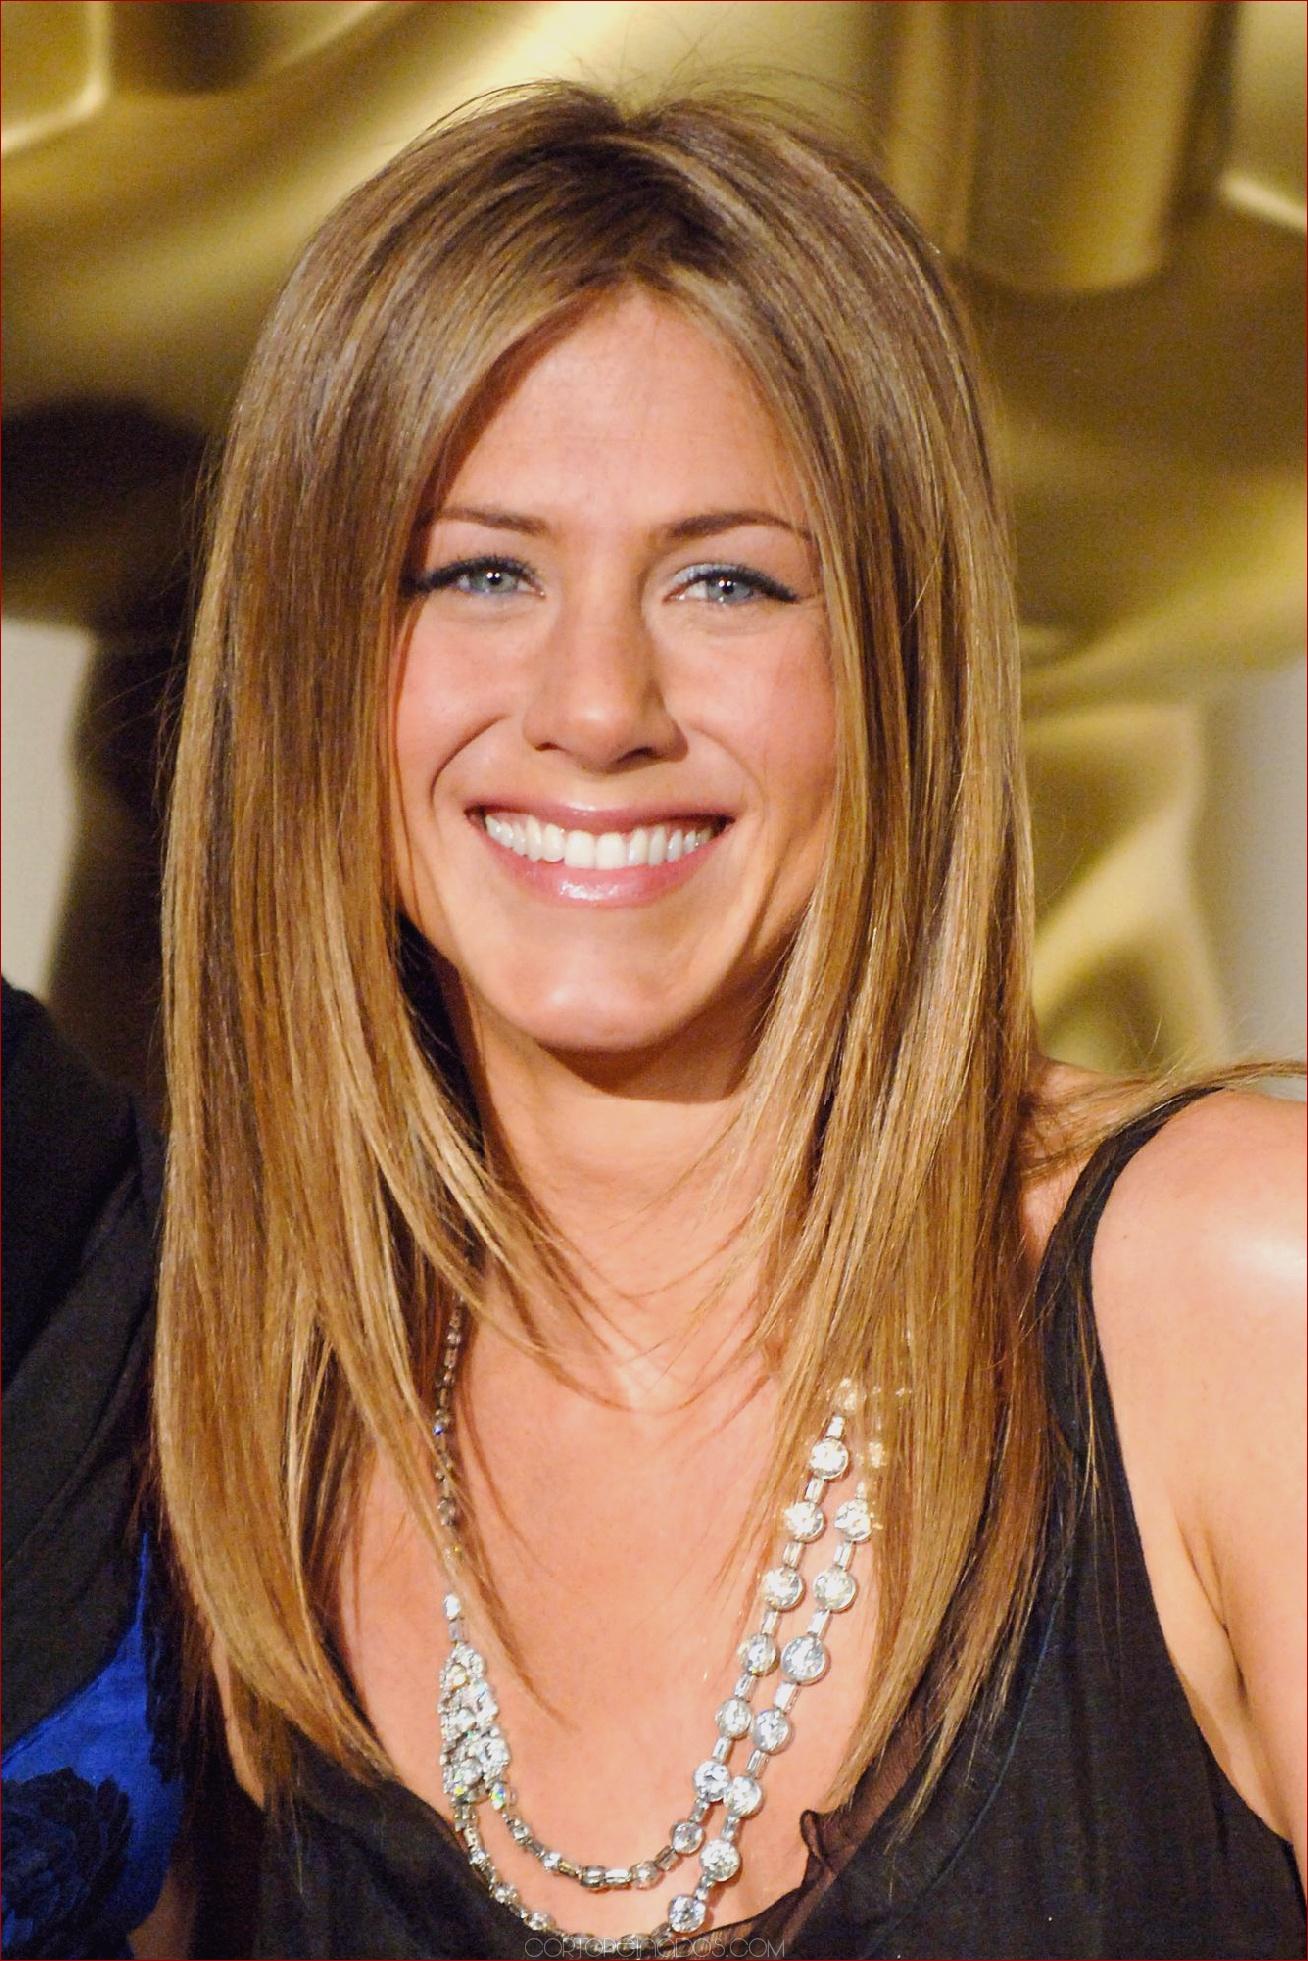 De moda peinados de jennifer aniston Fotos de ideas de color de pelo - Peinado de Jennifer Aniston - 25 estilos de peinados de ...